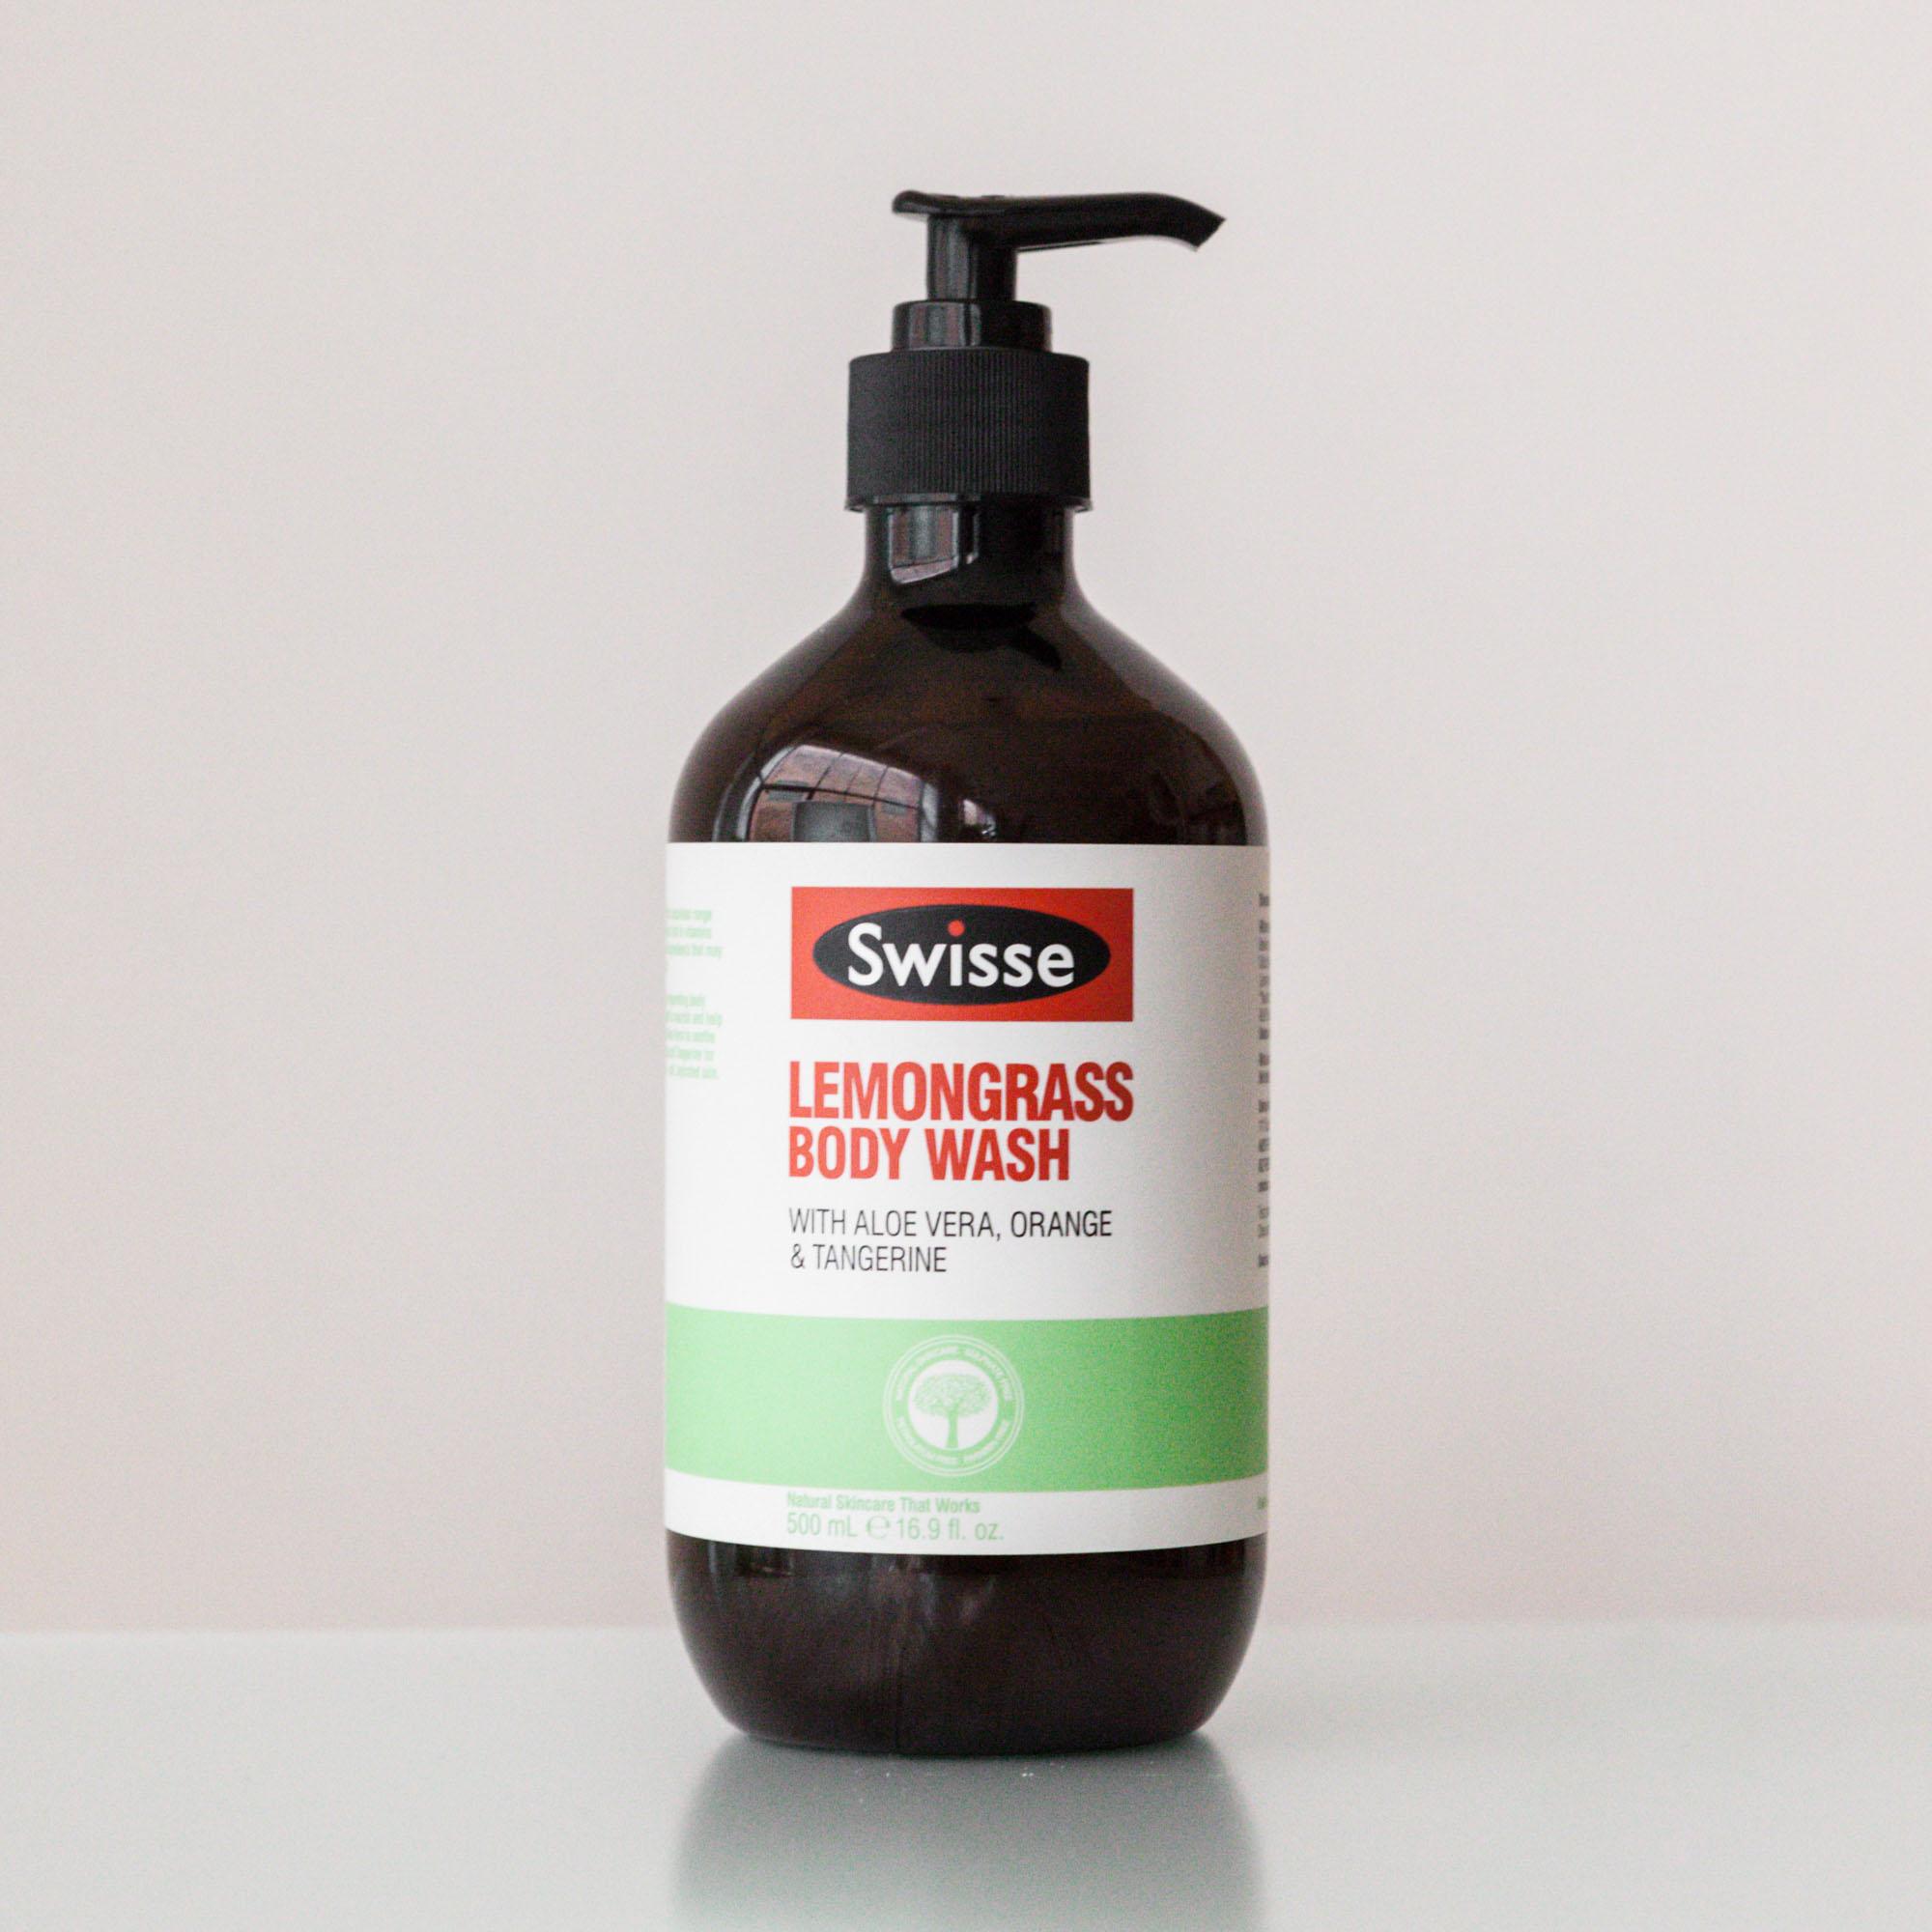 Swisse Lemongrass Body Wash Noema Product Review.jpg